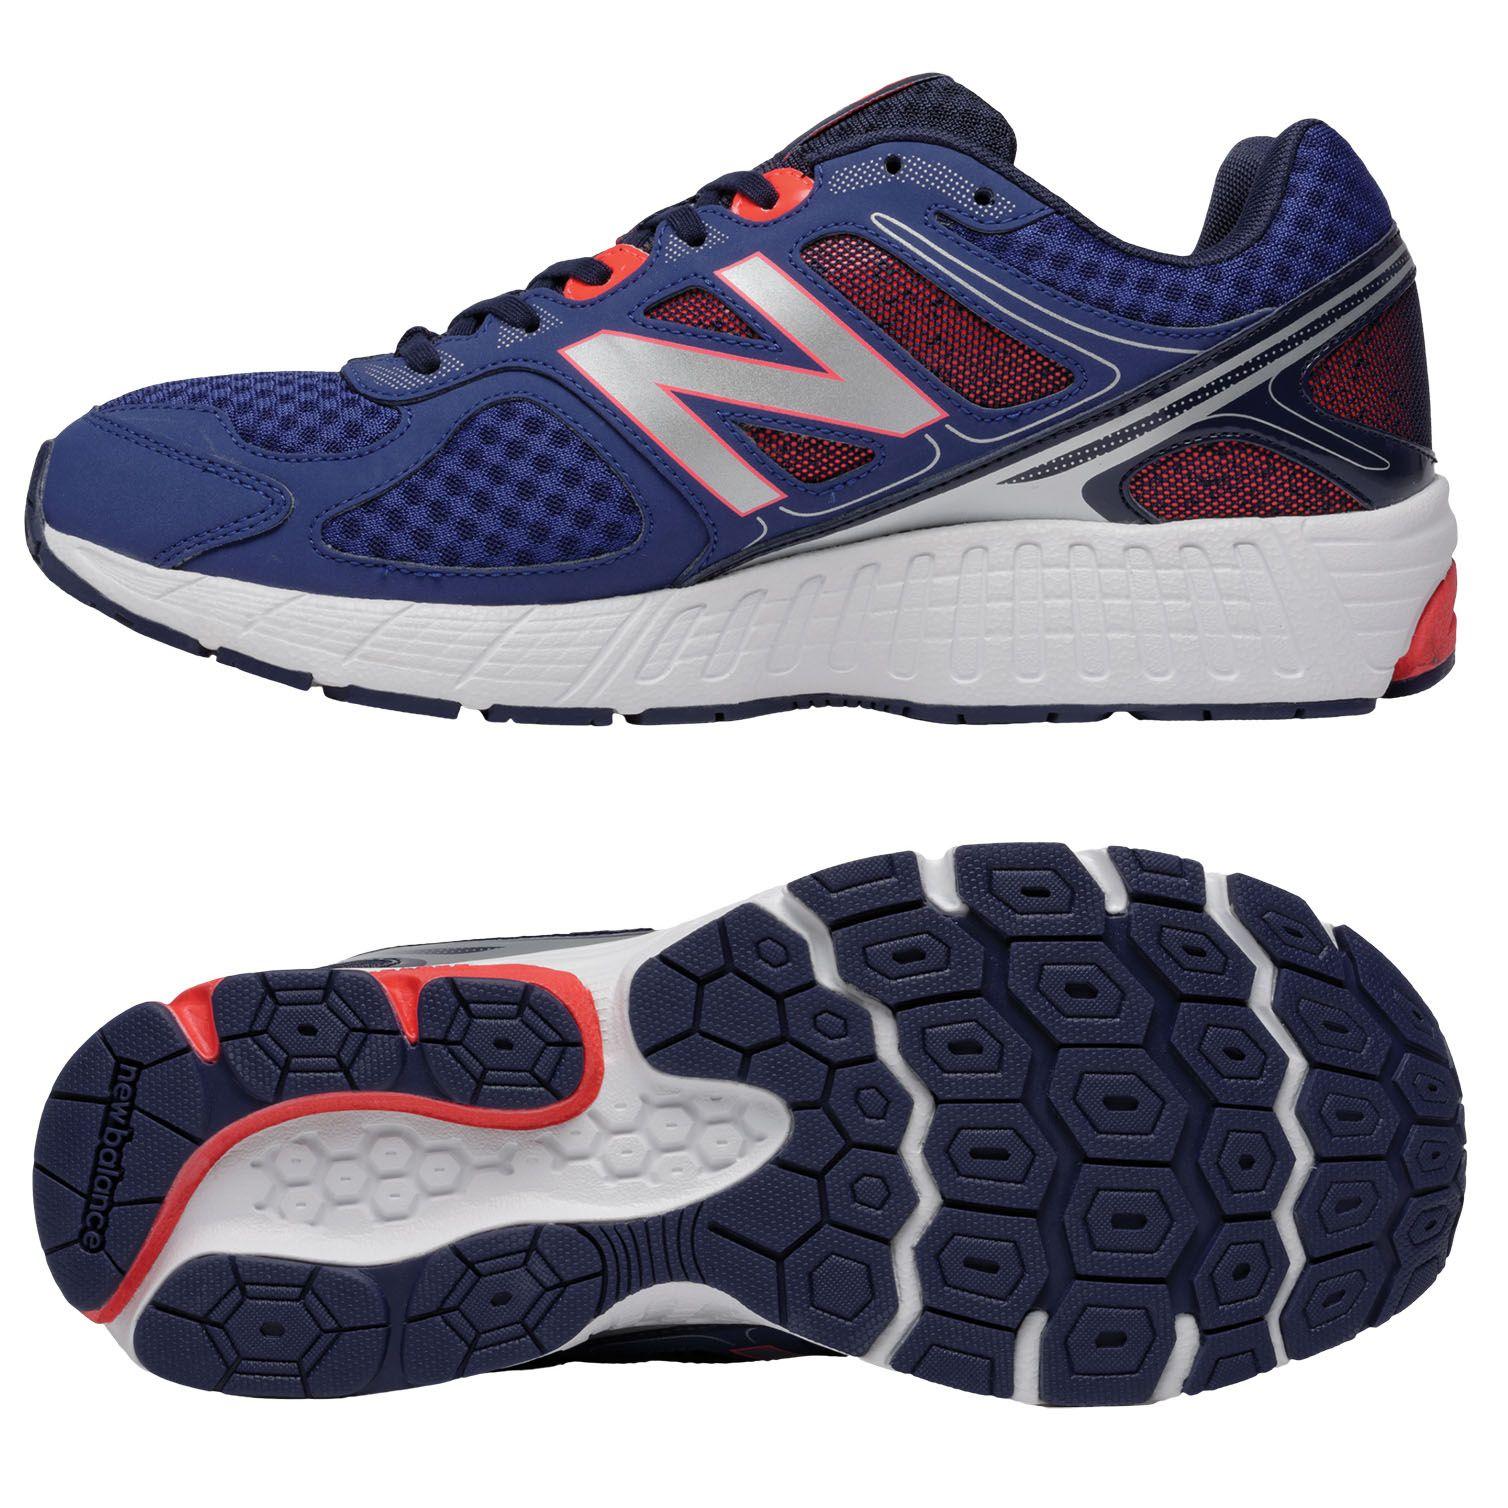 new balance 670 v1 mens running shoes ss16 sweatband